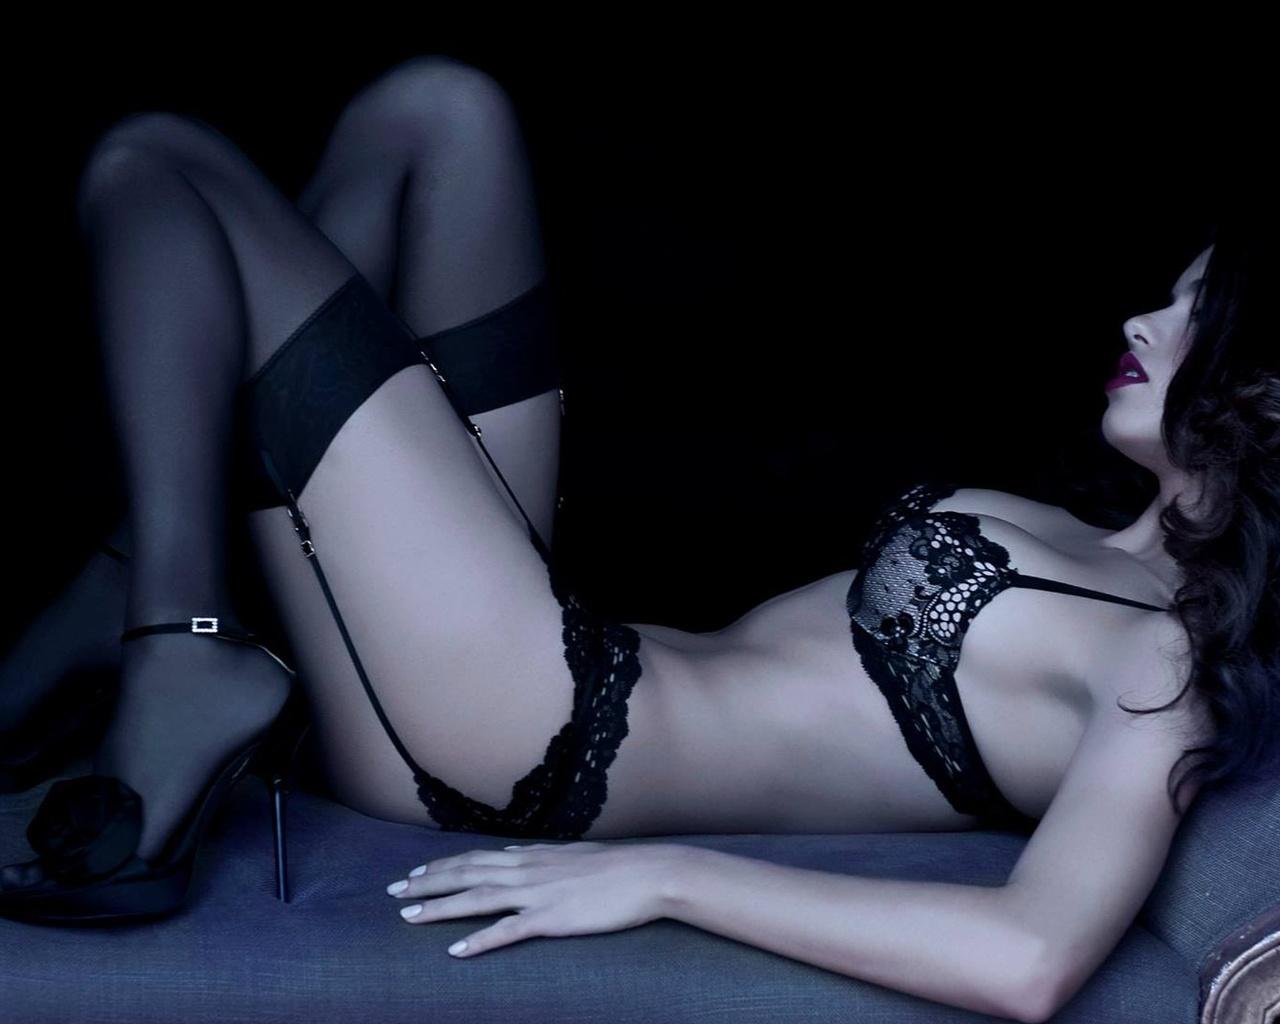 adriana, lima, модель, красавица, лежит